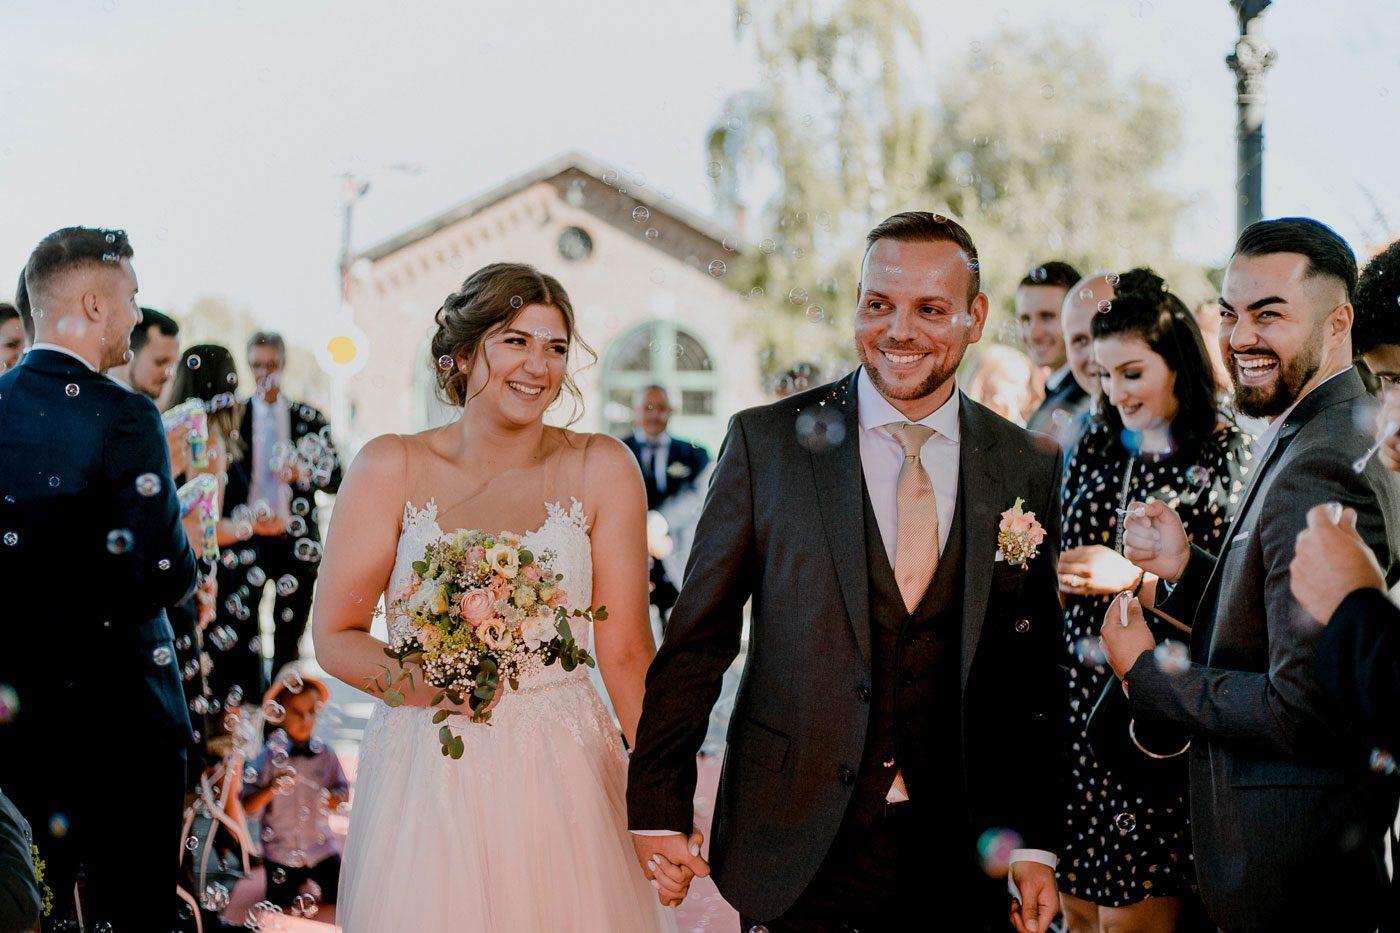 Brautpaar auszug – gesehen bei frauimmer-herrewig.de